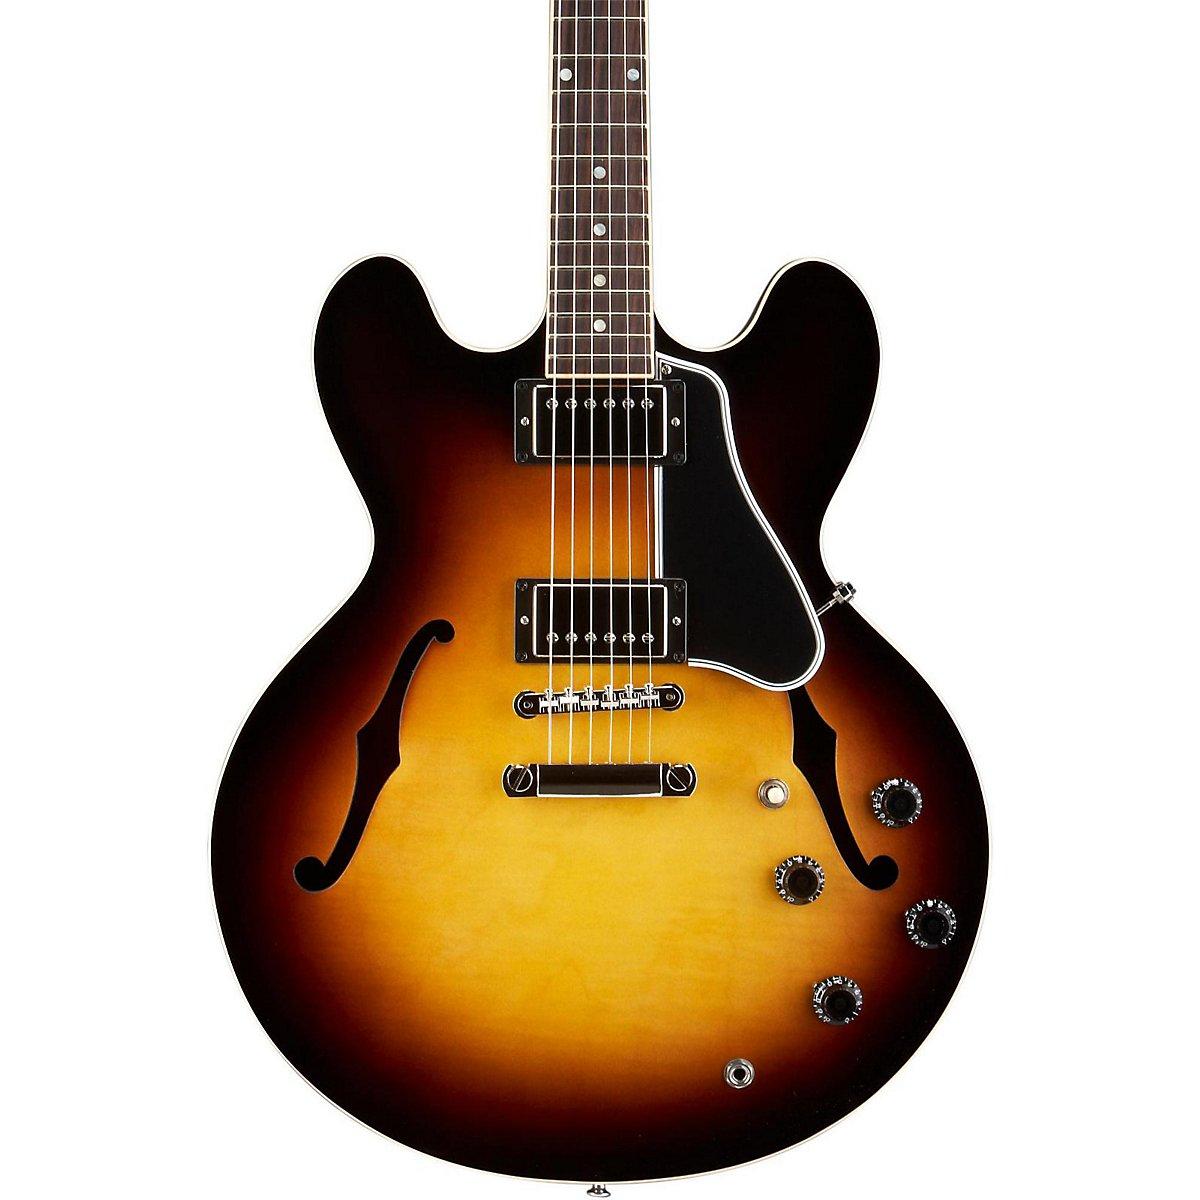 Gibson Memphis esdt14vsnh1 ES-335 semi-hollow-body guitarra eléctrica, figurado Vintage Sunburst: Amazon.es: Instrumentos musicales